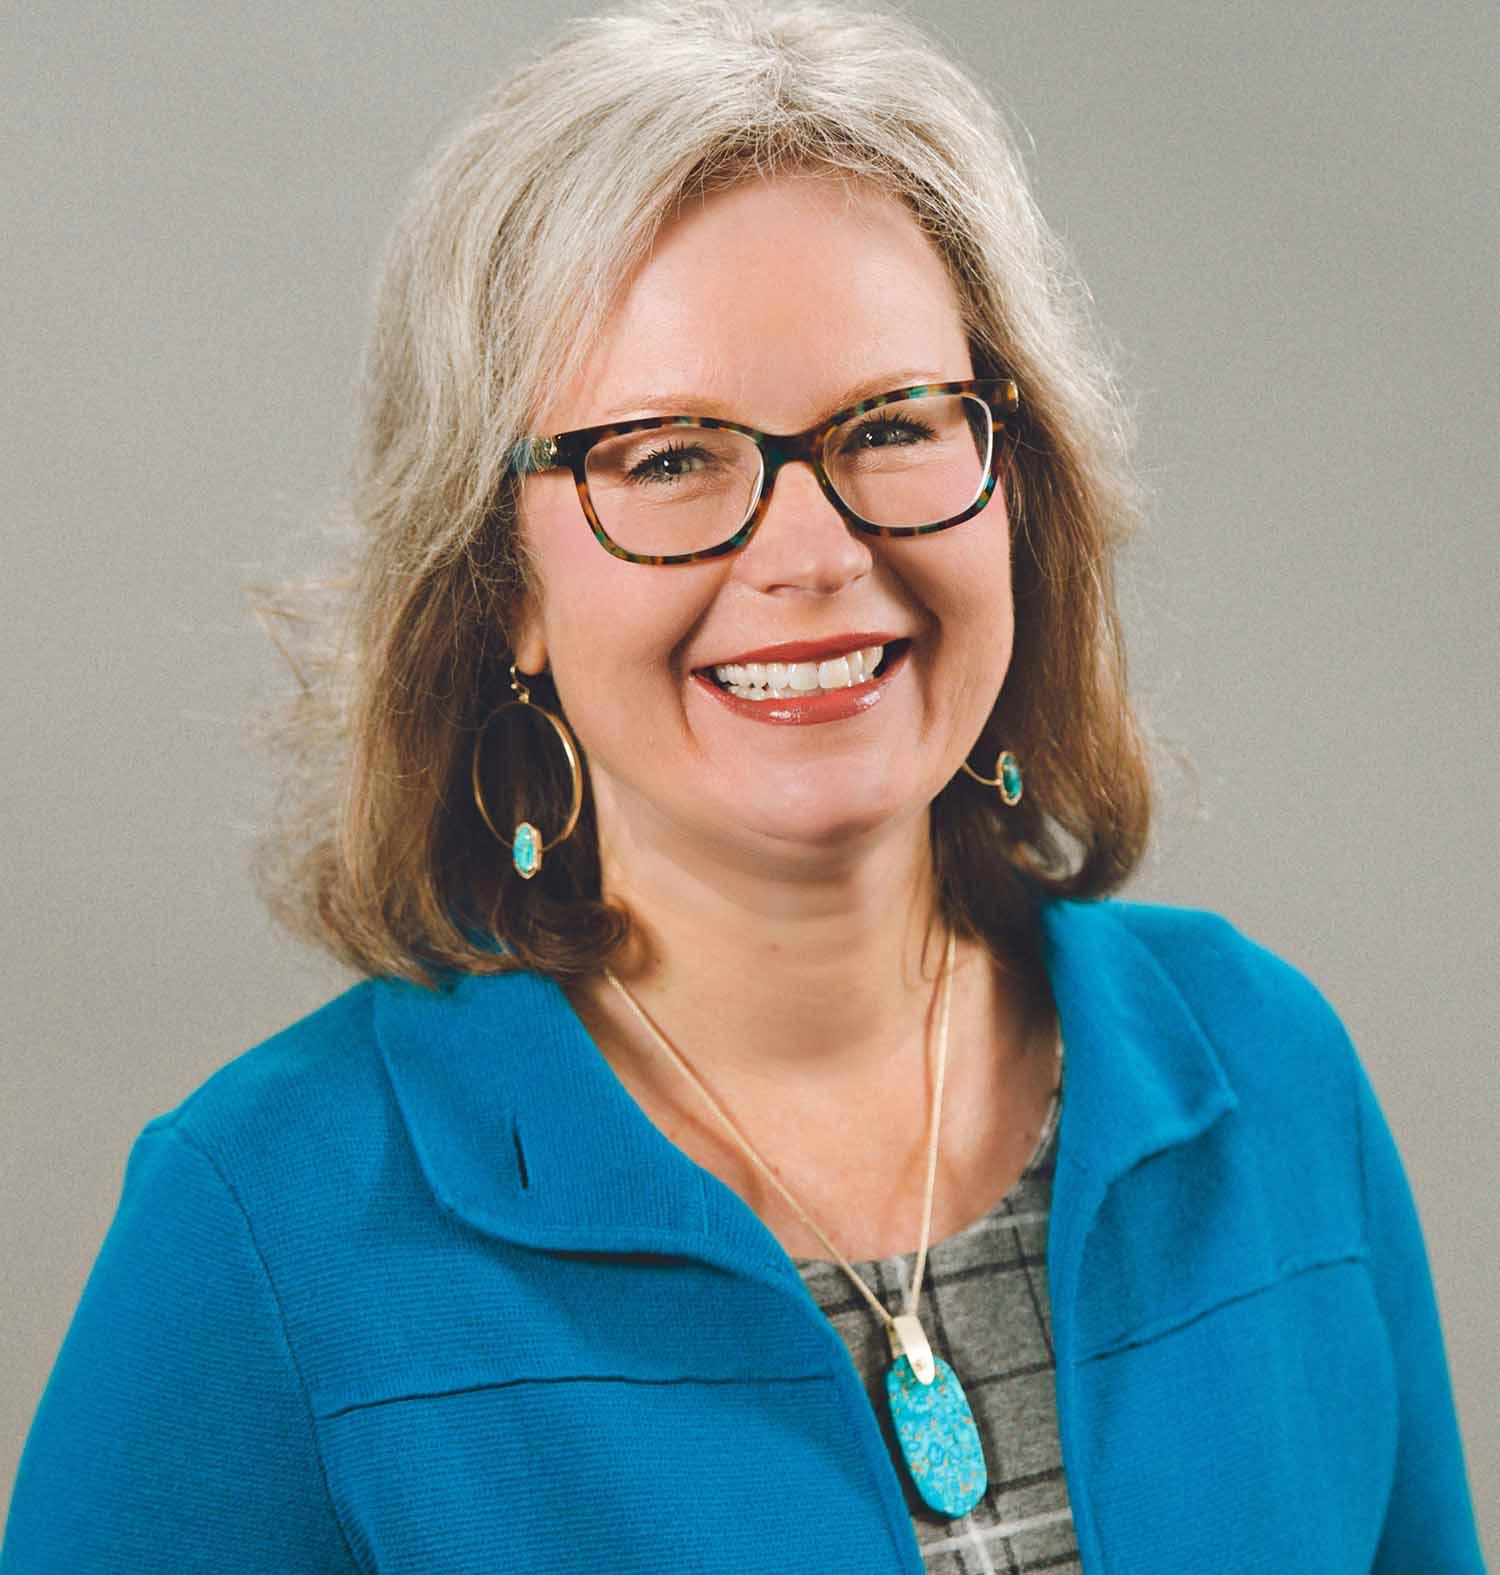 Lisa Kirkpatrick, St. Edward's University